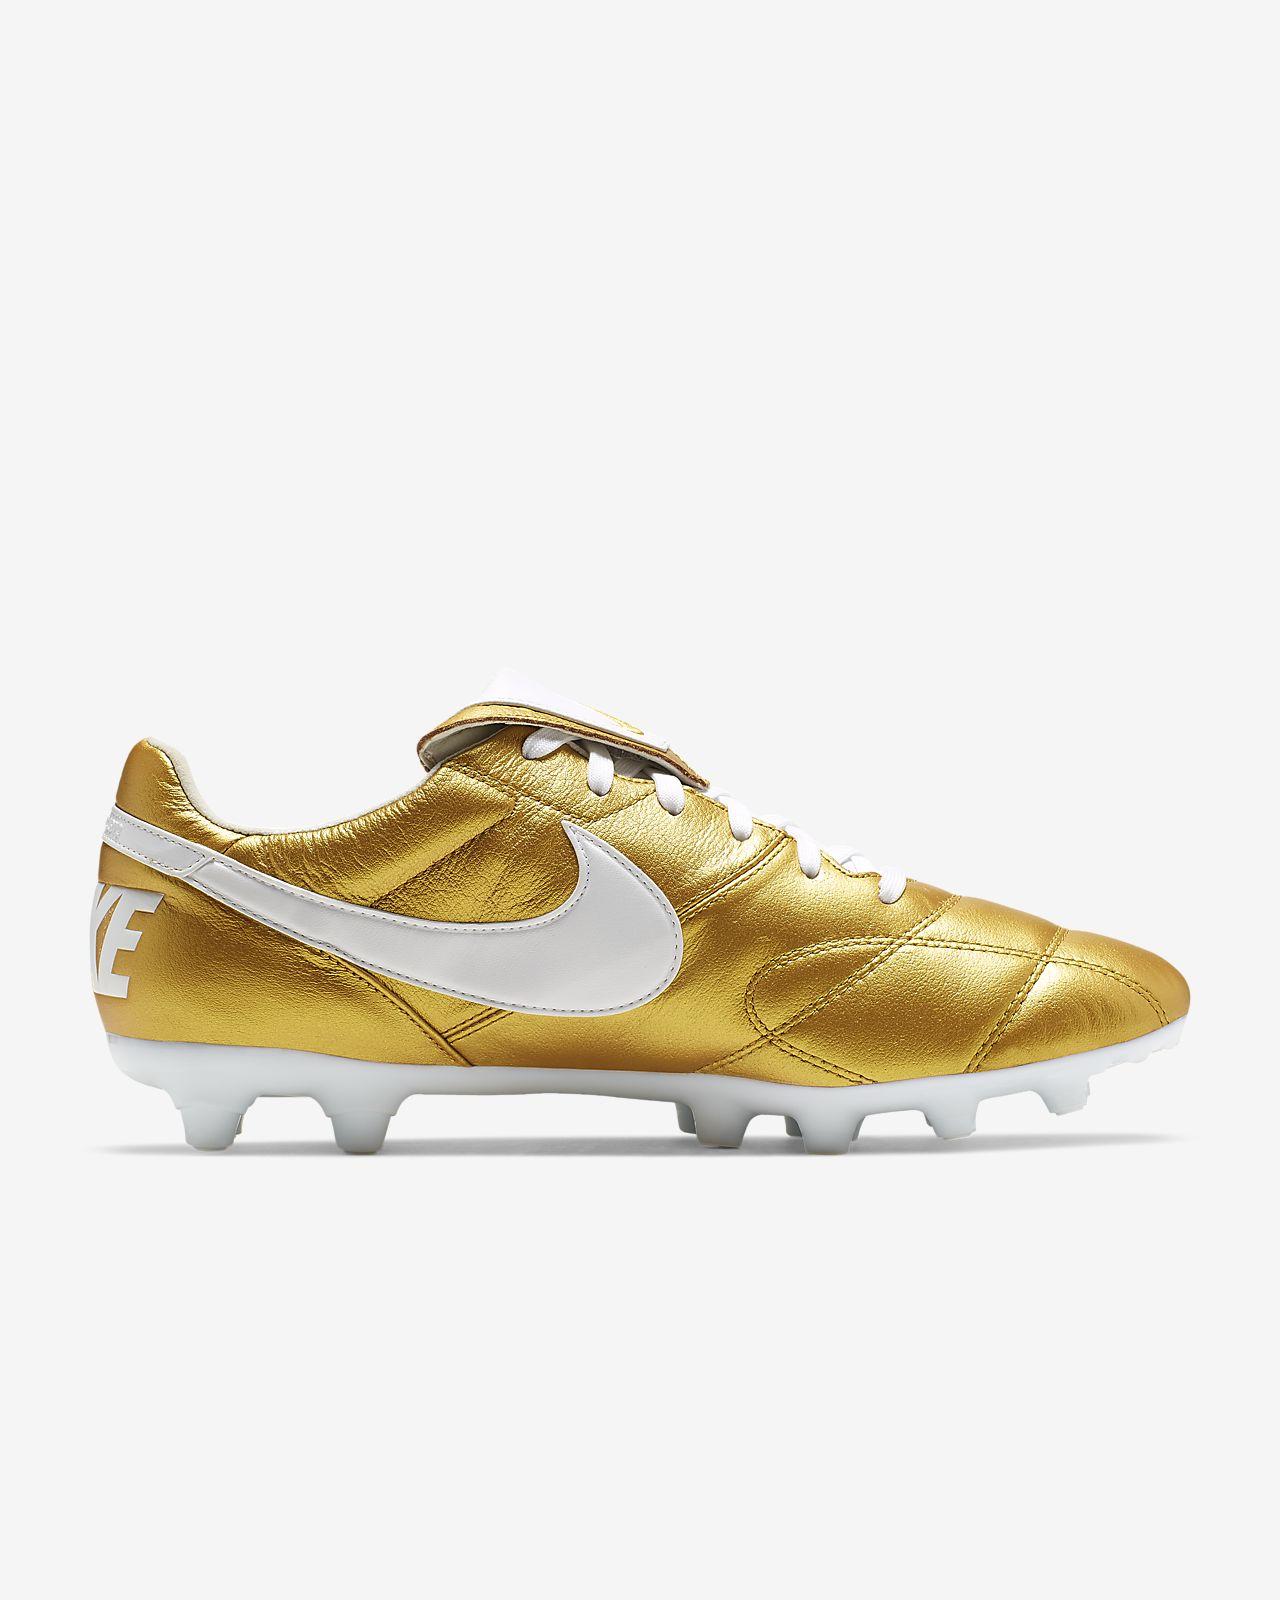 ee4177e67683 Nike Premier II FG Firm-Ground Soccer Cleat. Nike.com